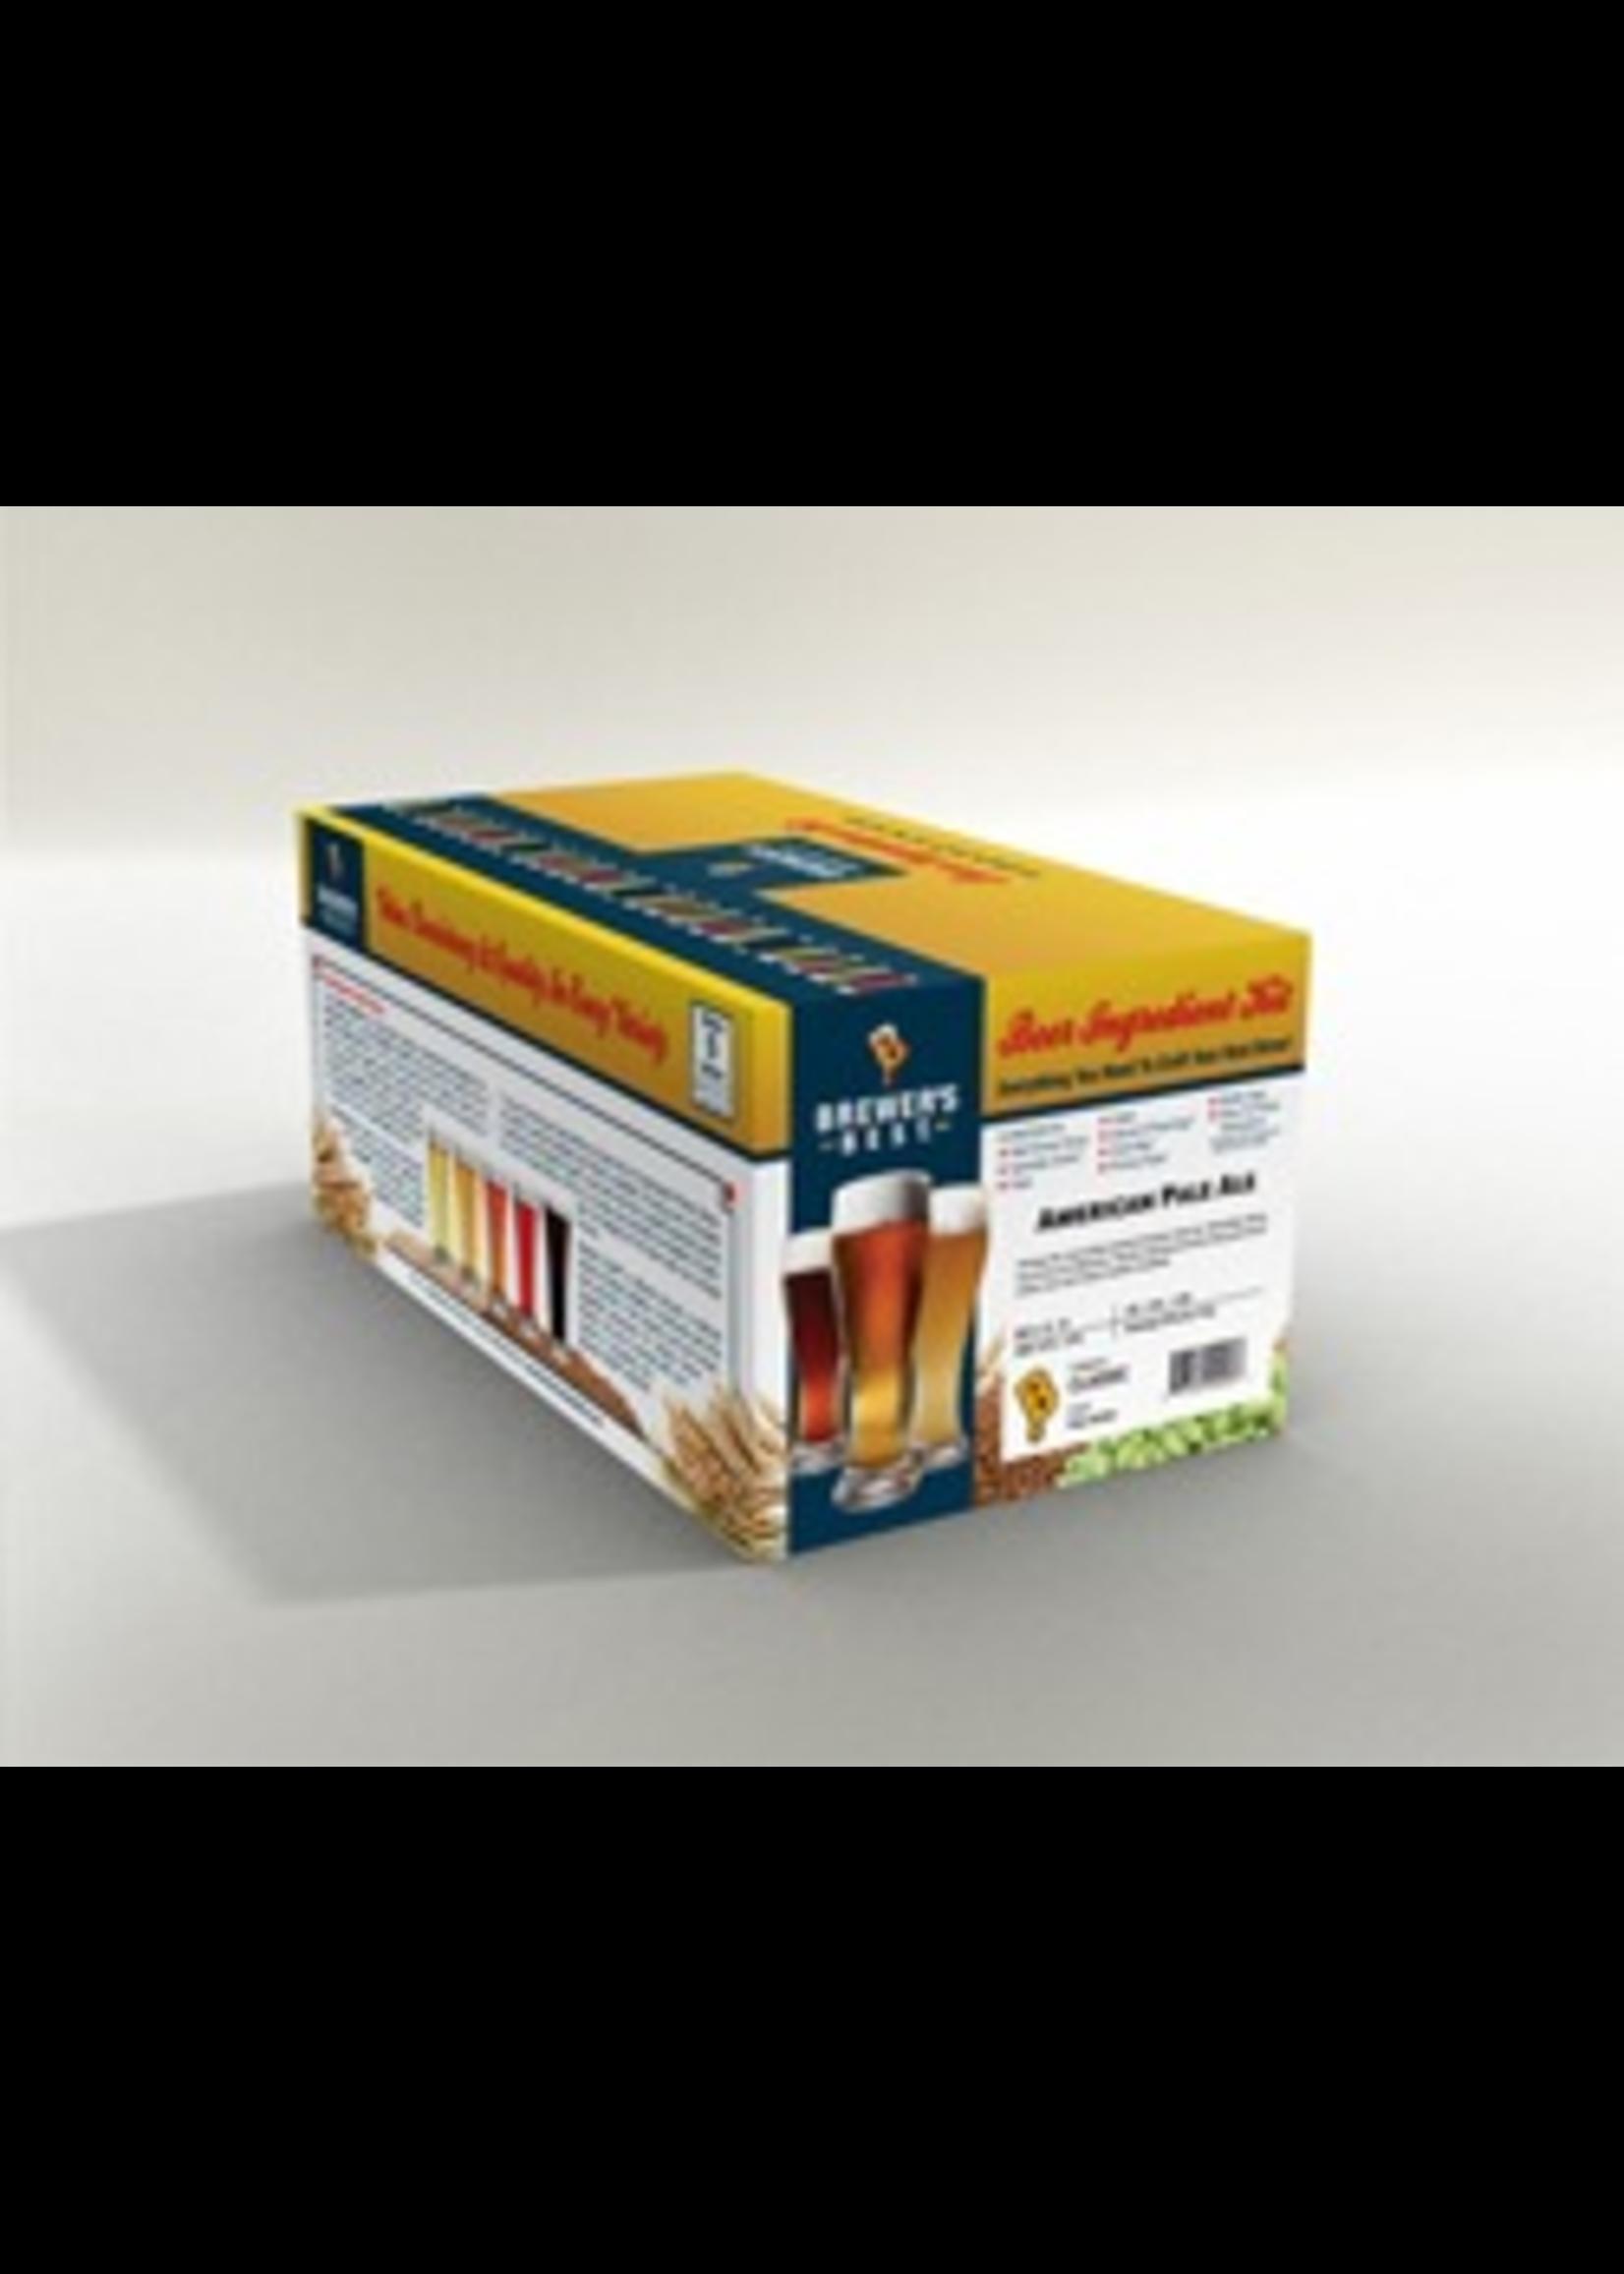 Ingredient Kits Brewer's Best Double IPA - 5 Gallon Ingredient Kit